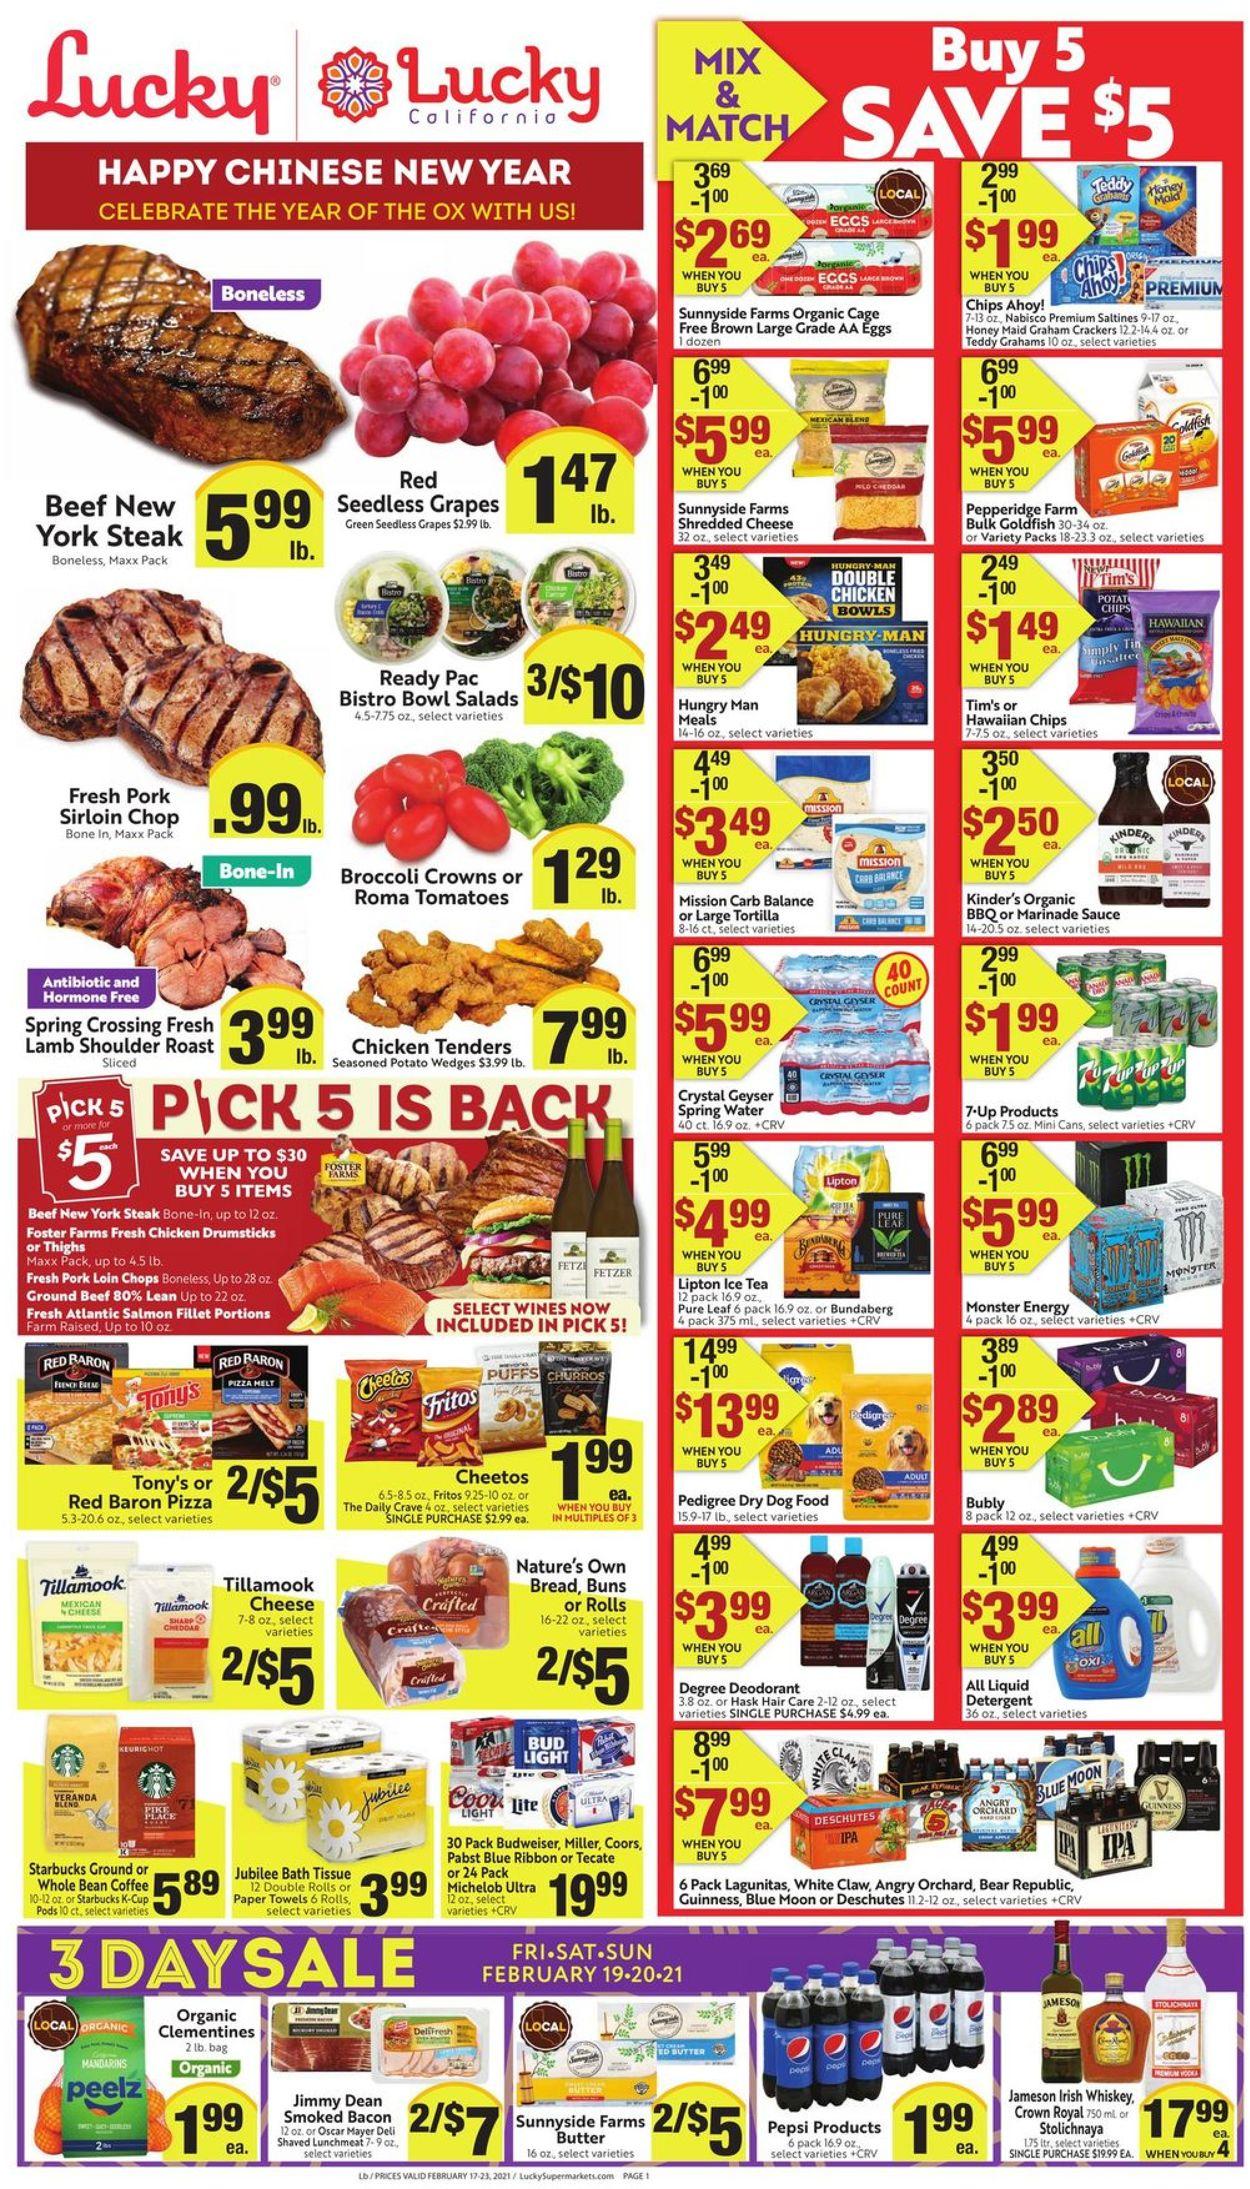 Lucky Supermarkets Weekly Ad Circular - valid 02/17-02/23/2021